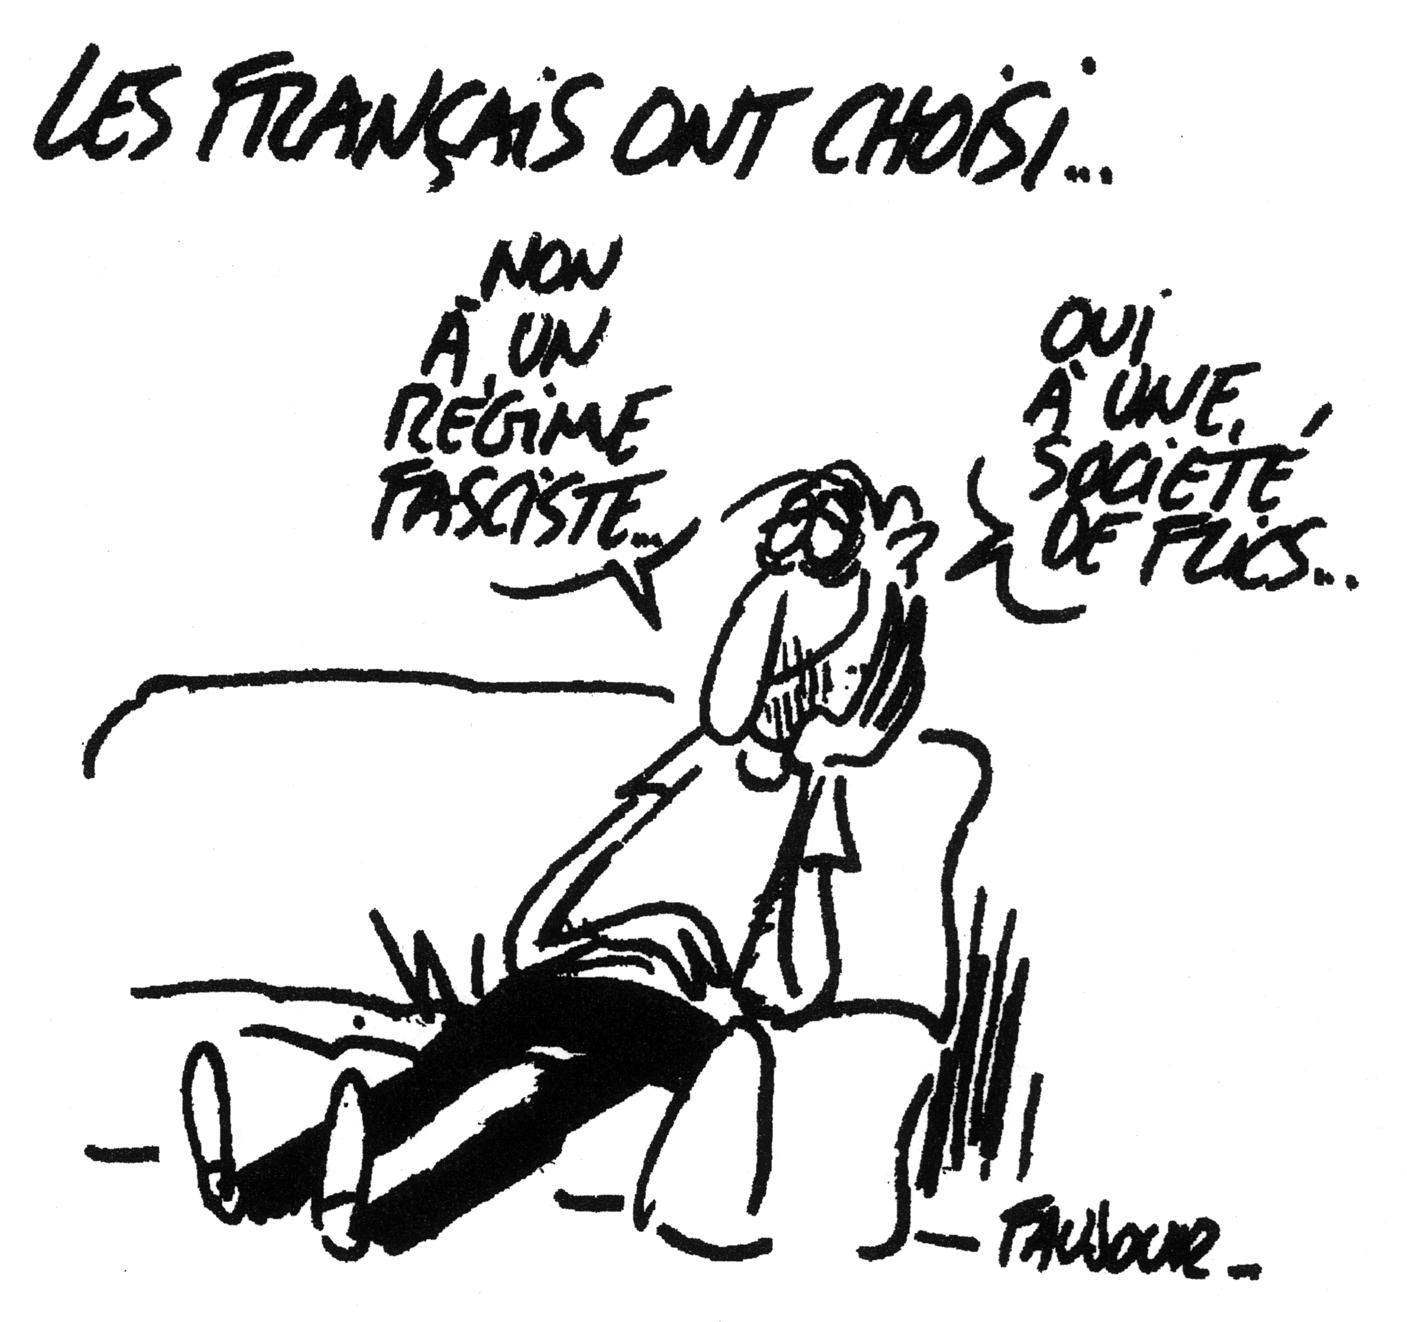 86-les-francais-ont-choisi.jpg